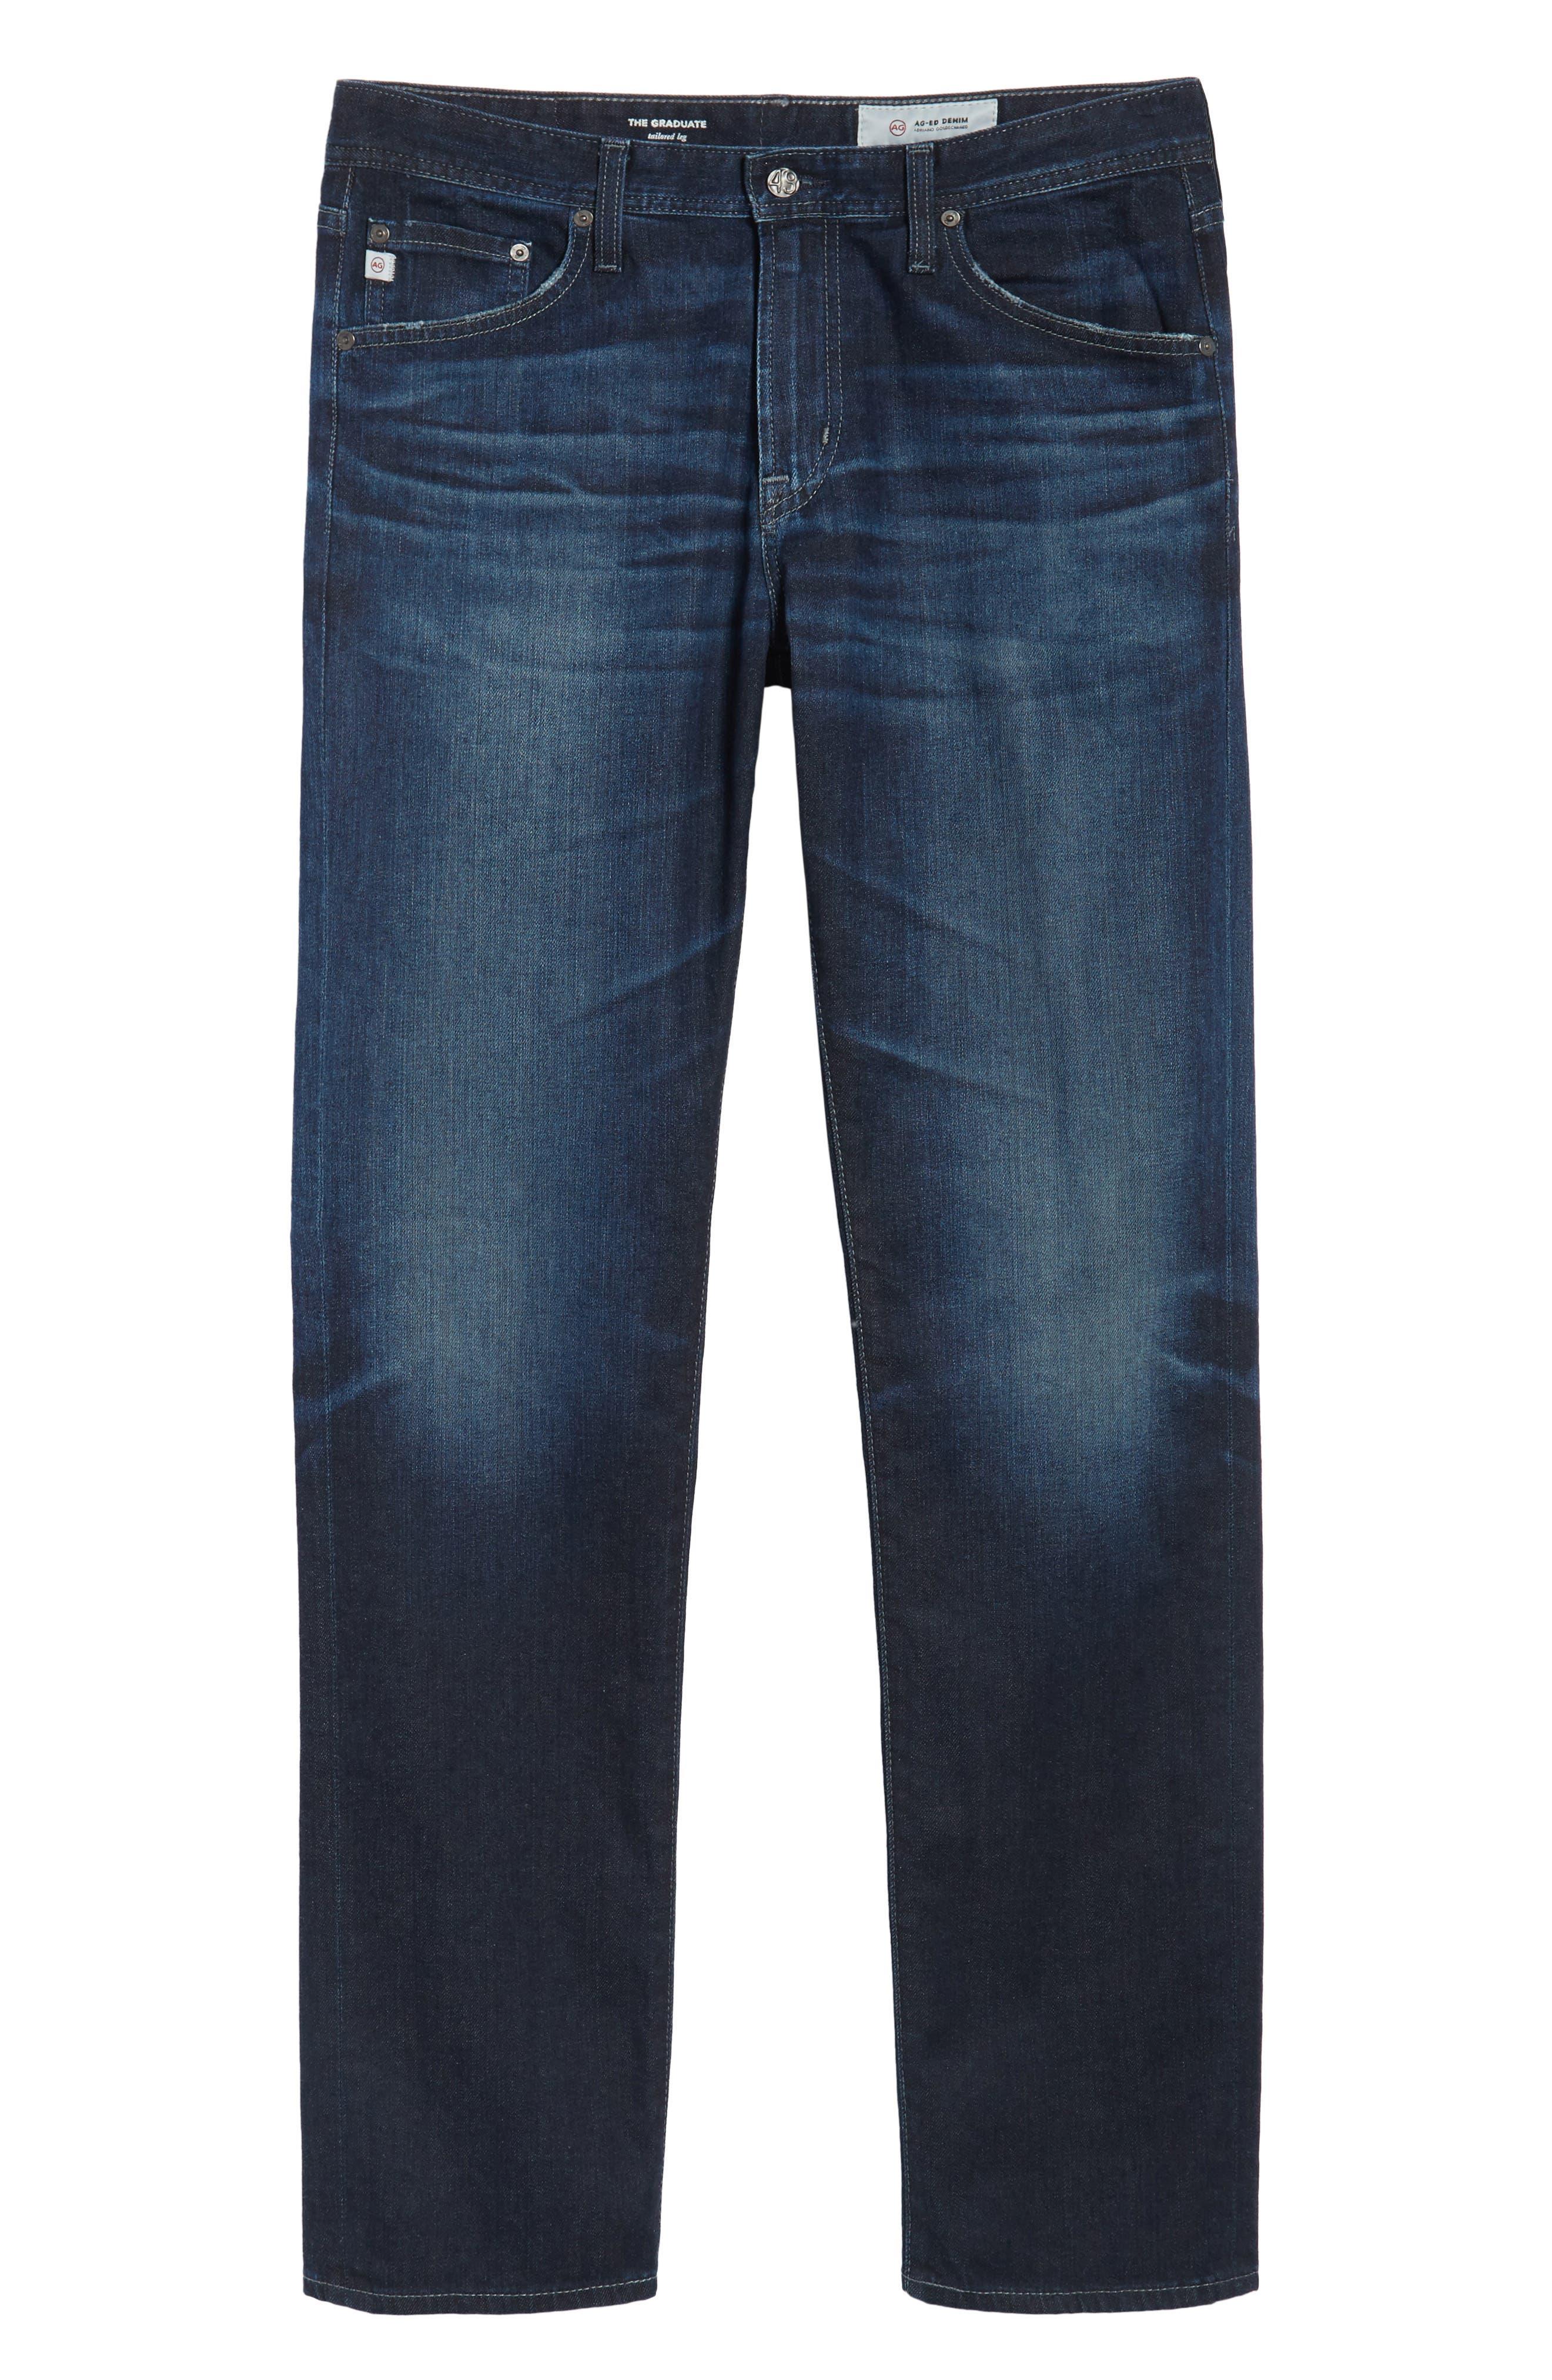 Graduate Slim Straight Fit Jeans,                             Alternate thumbnail 6, color,                             482